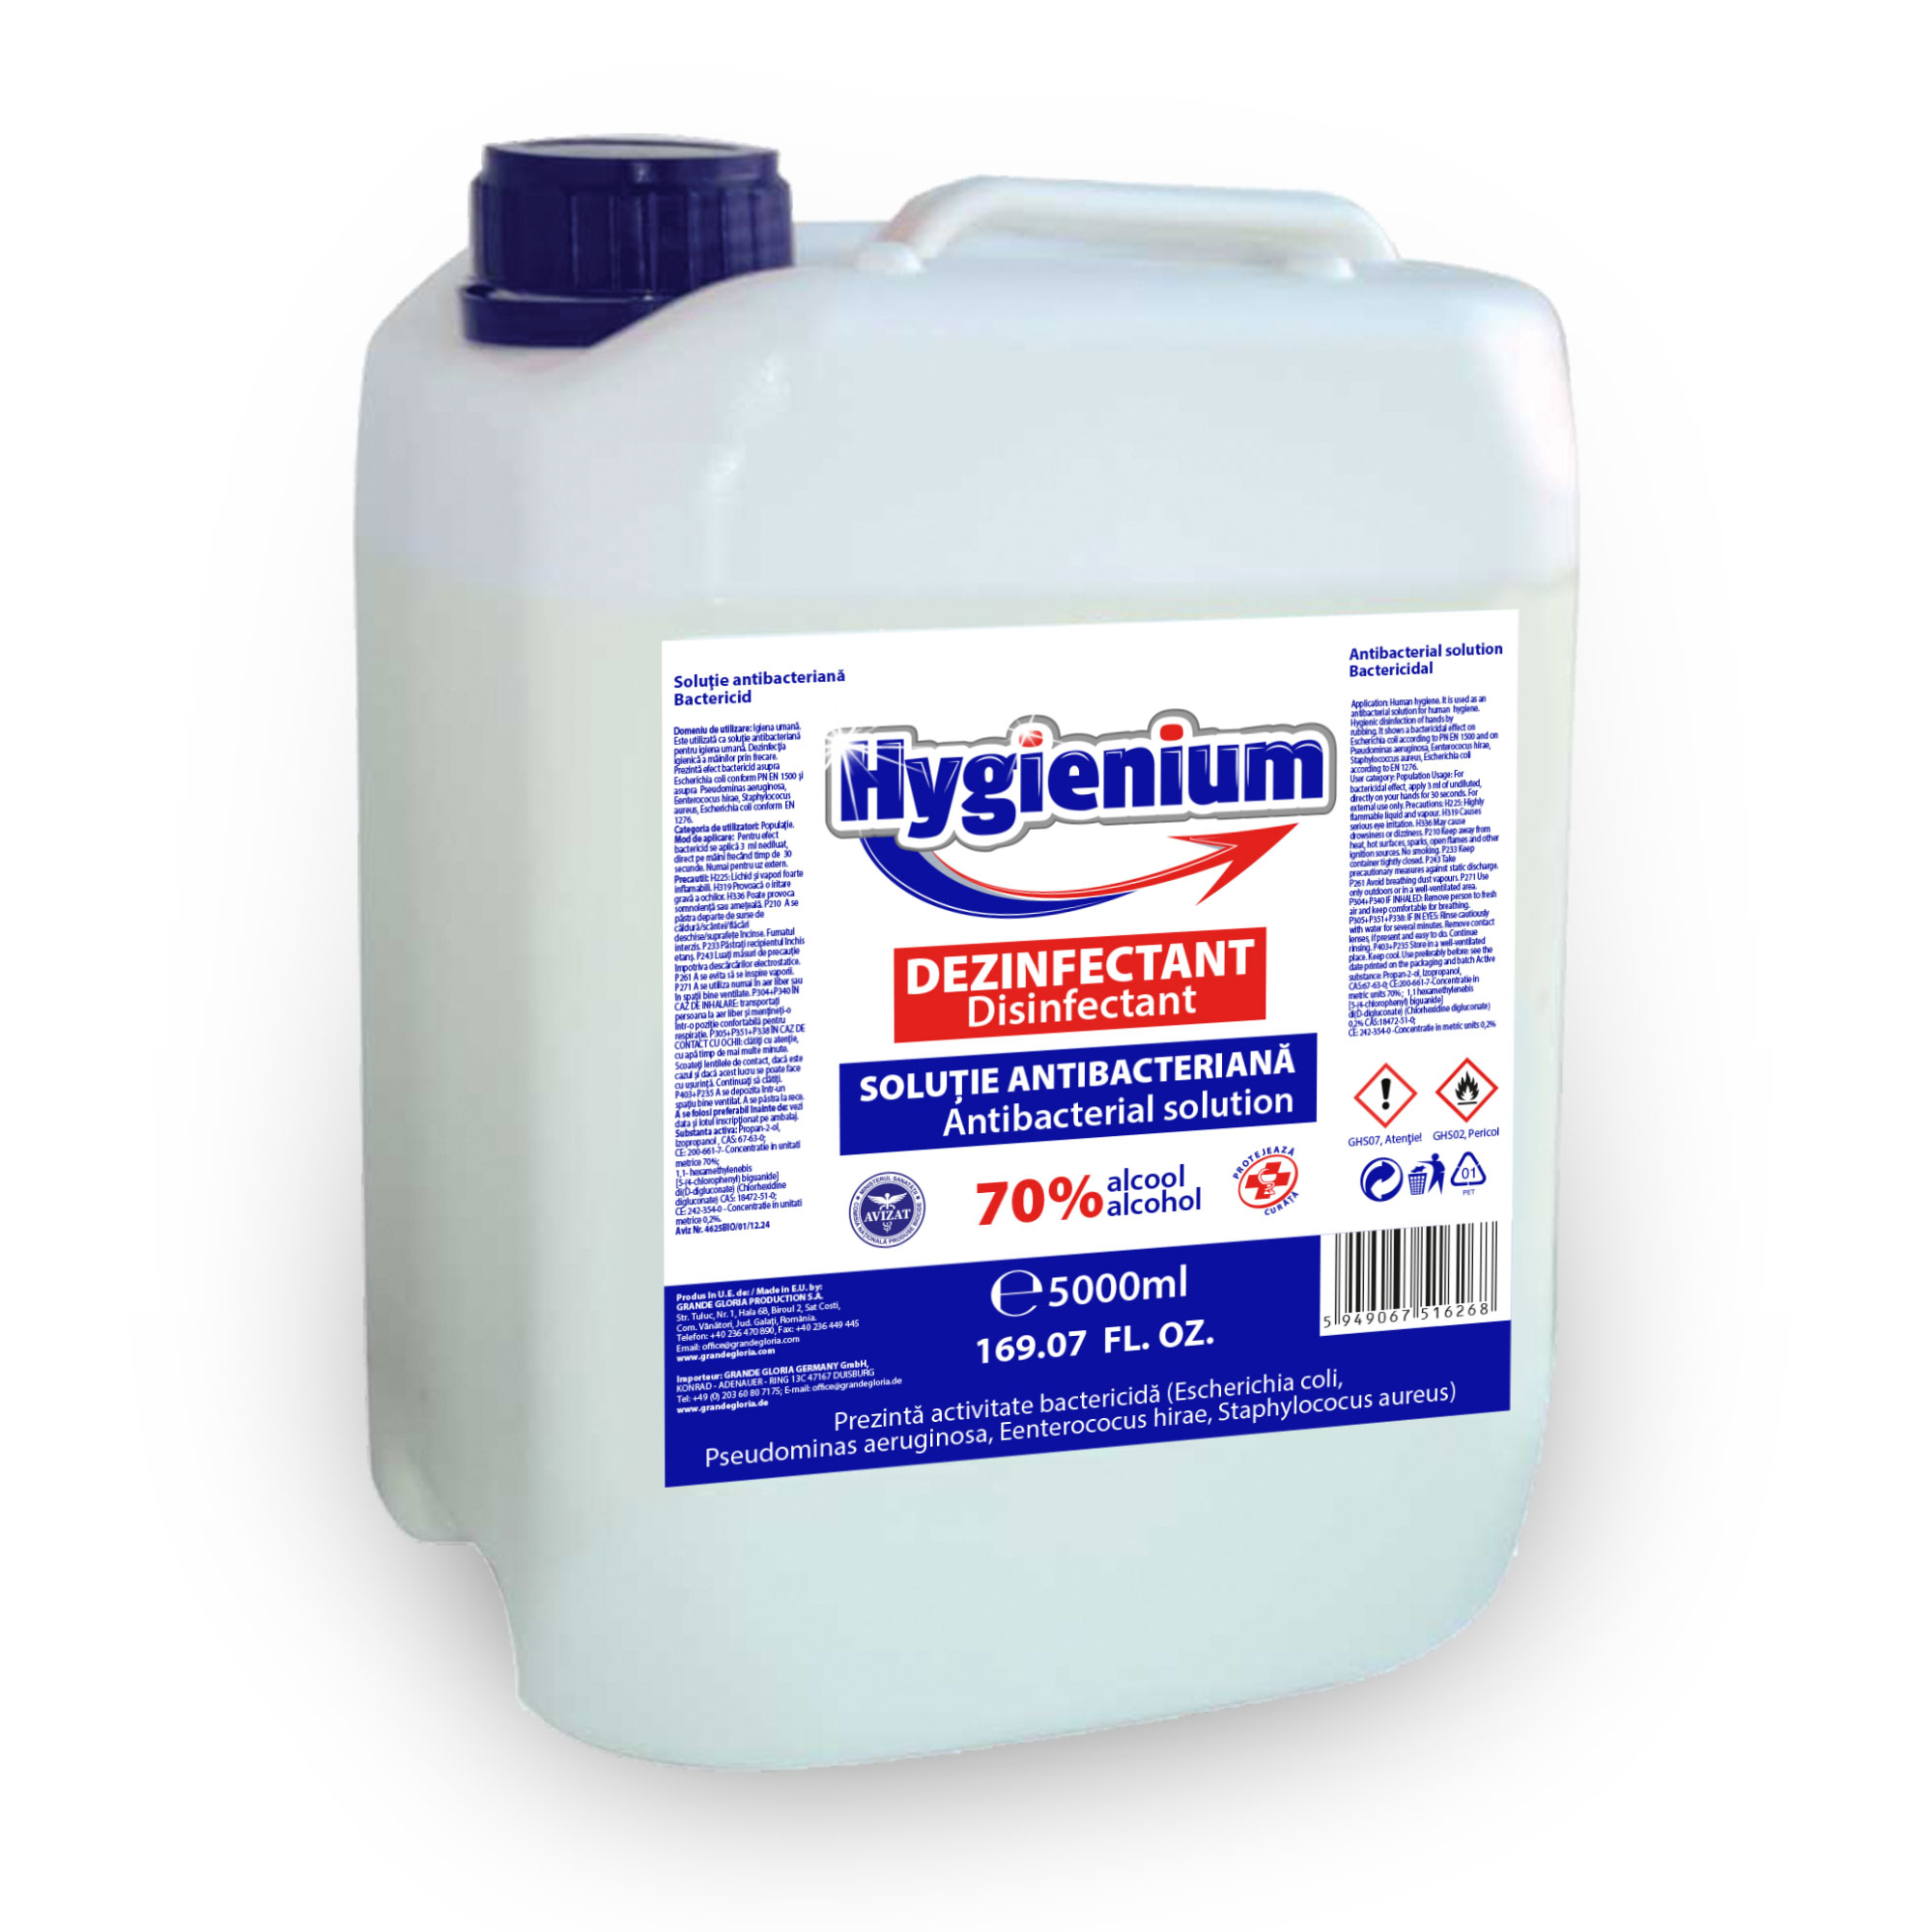 Solutie Antibacteriana 70% alcool, 5l